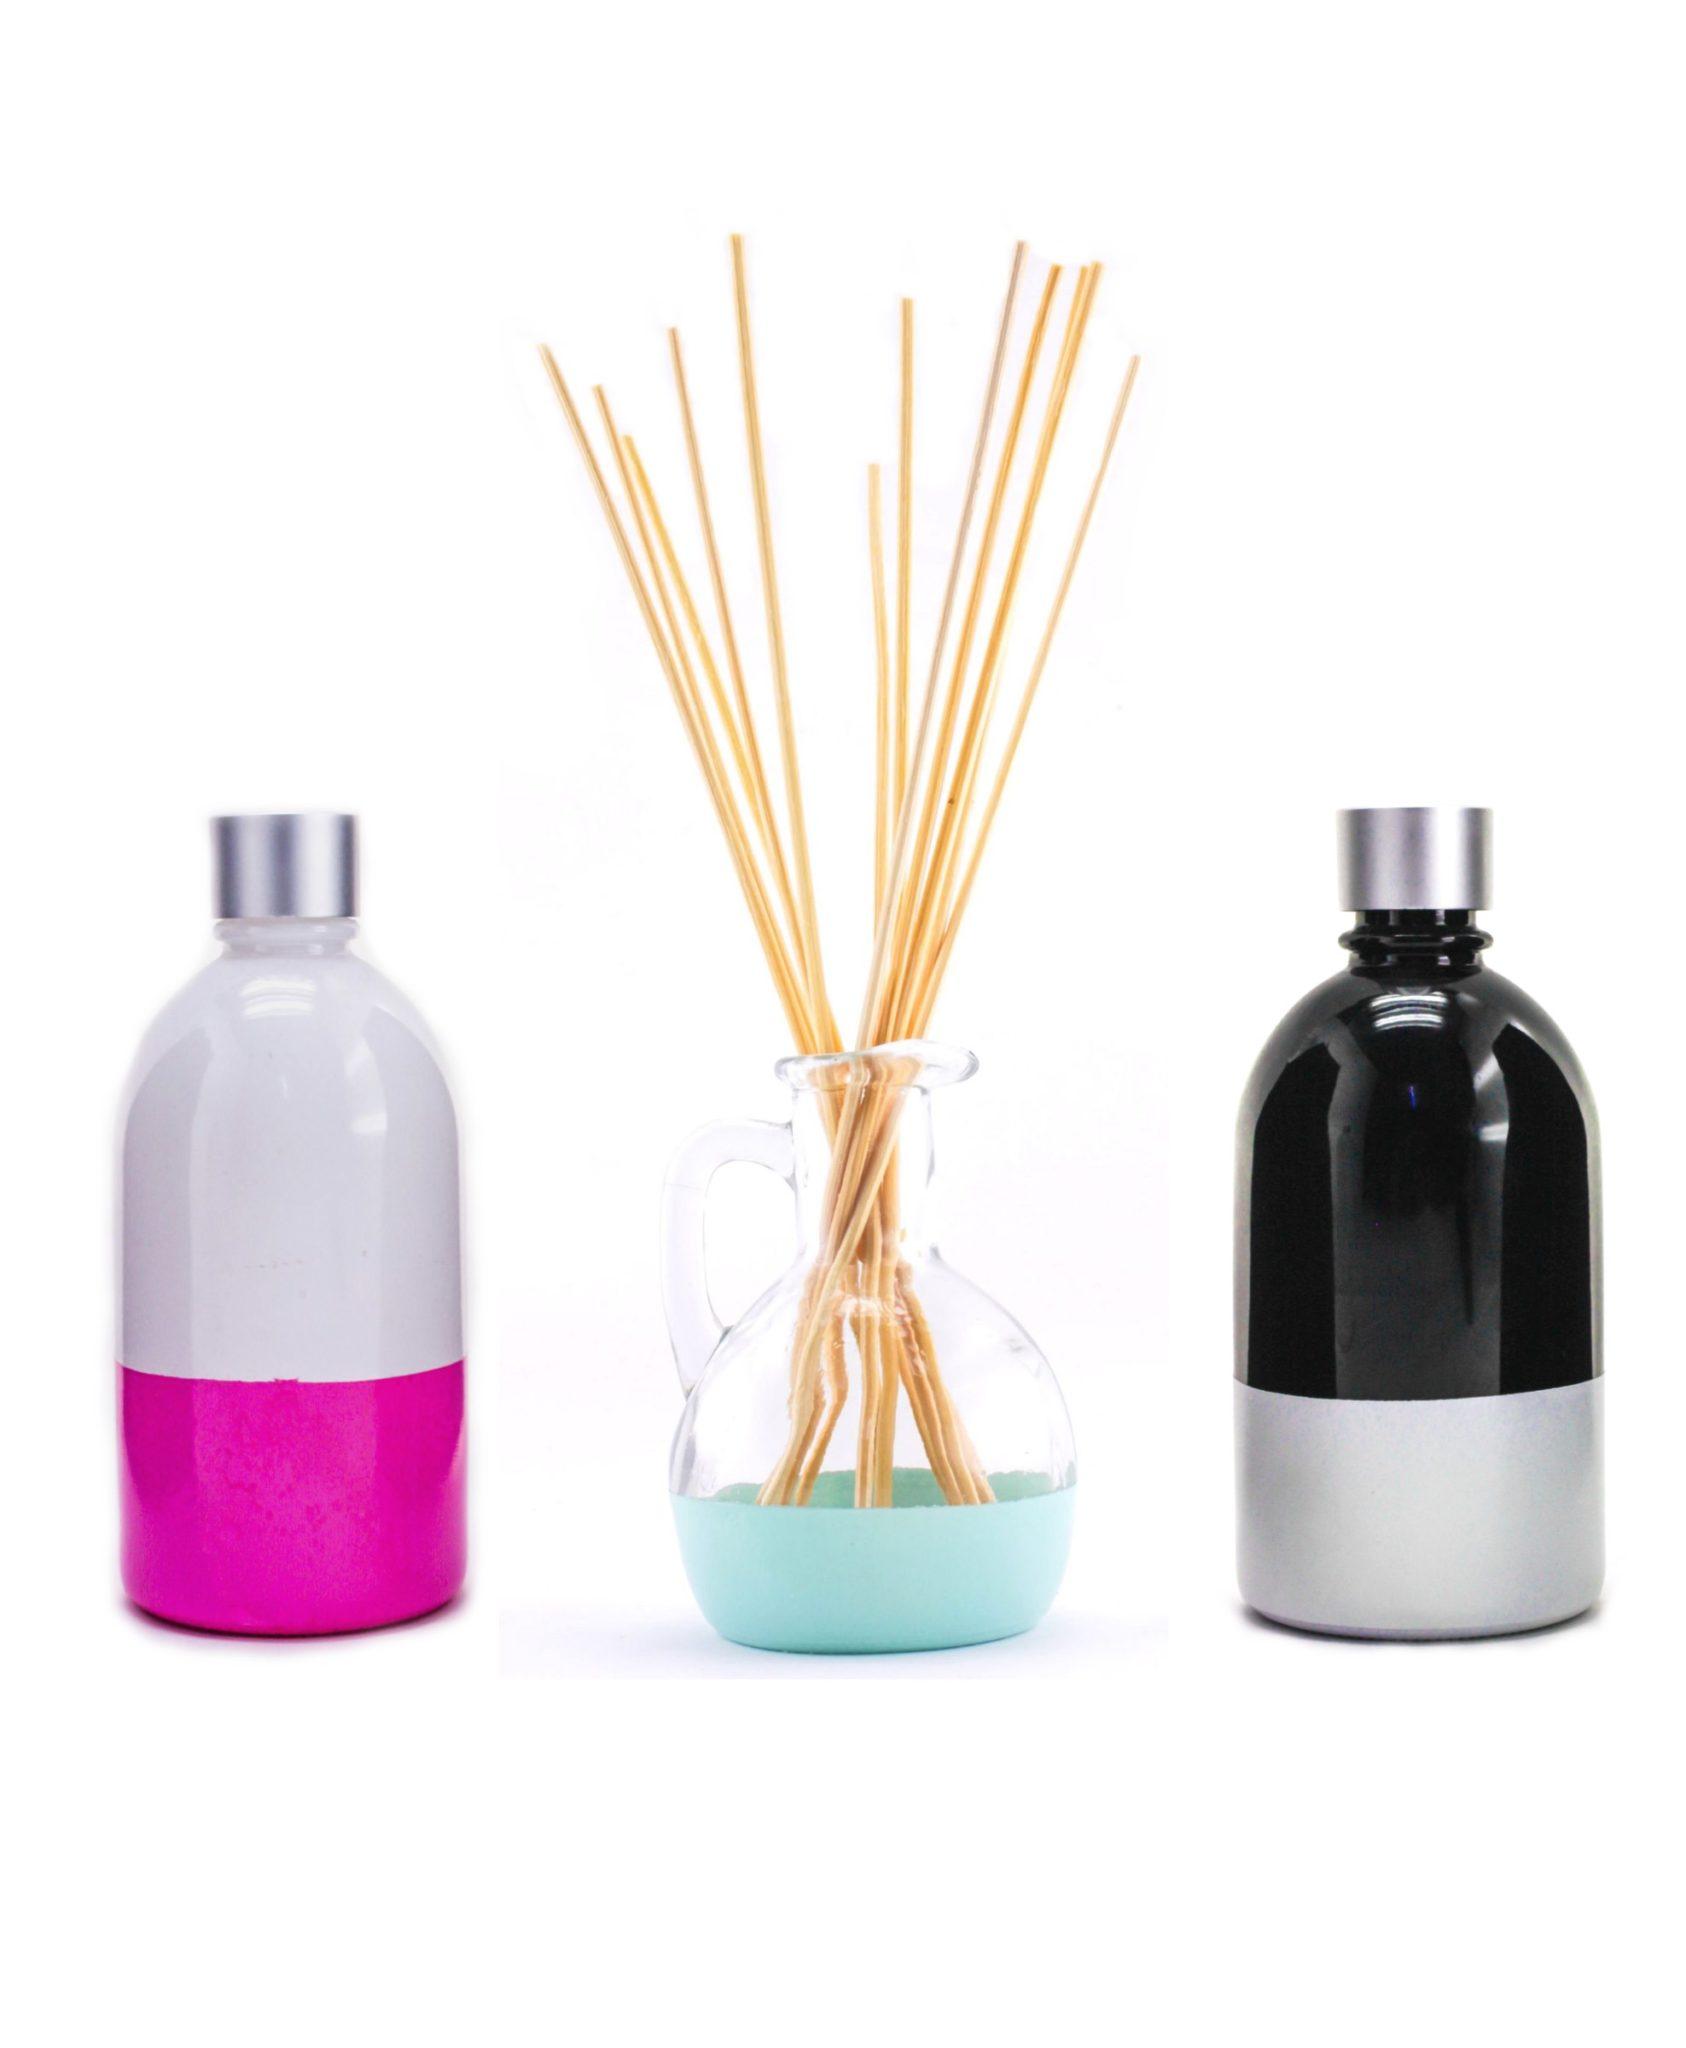 Diffuser Vessels